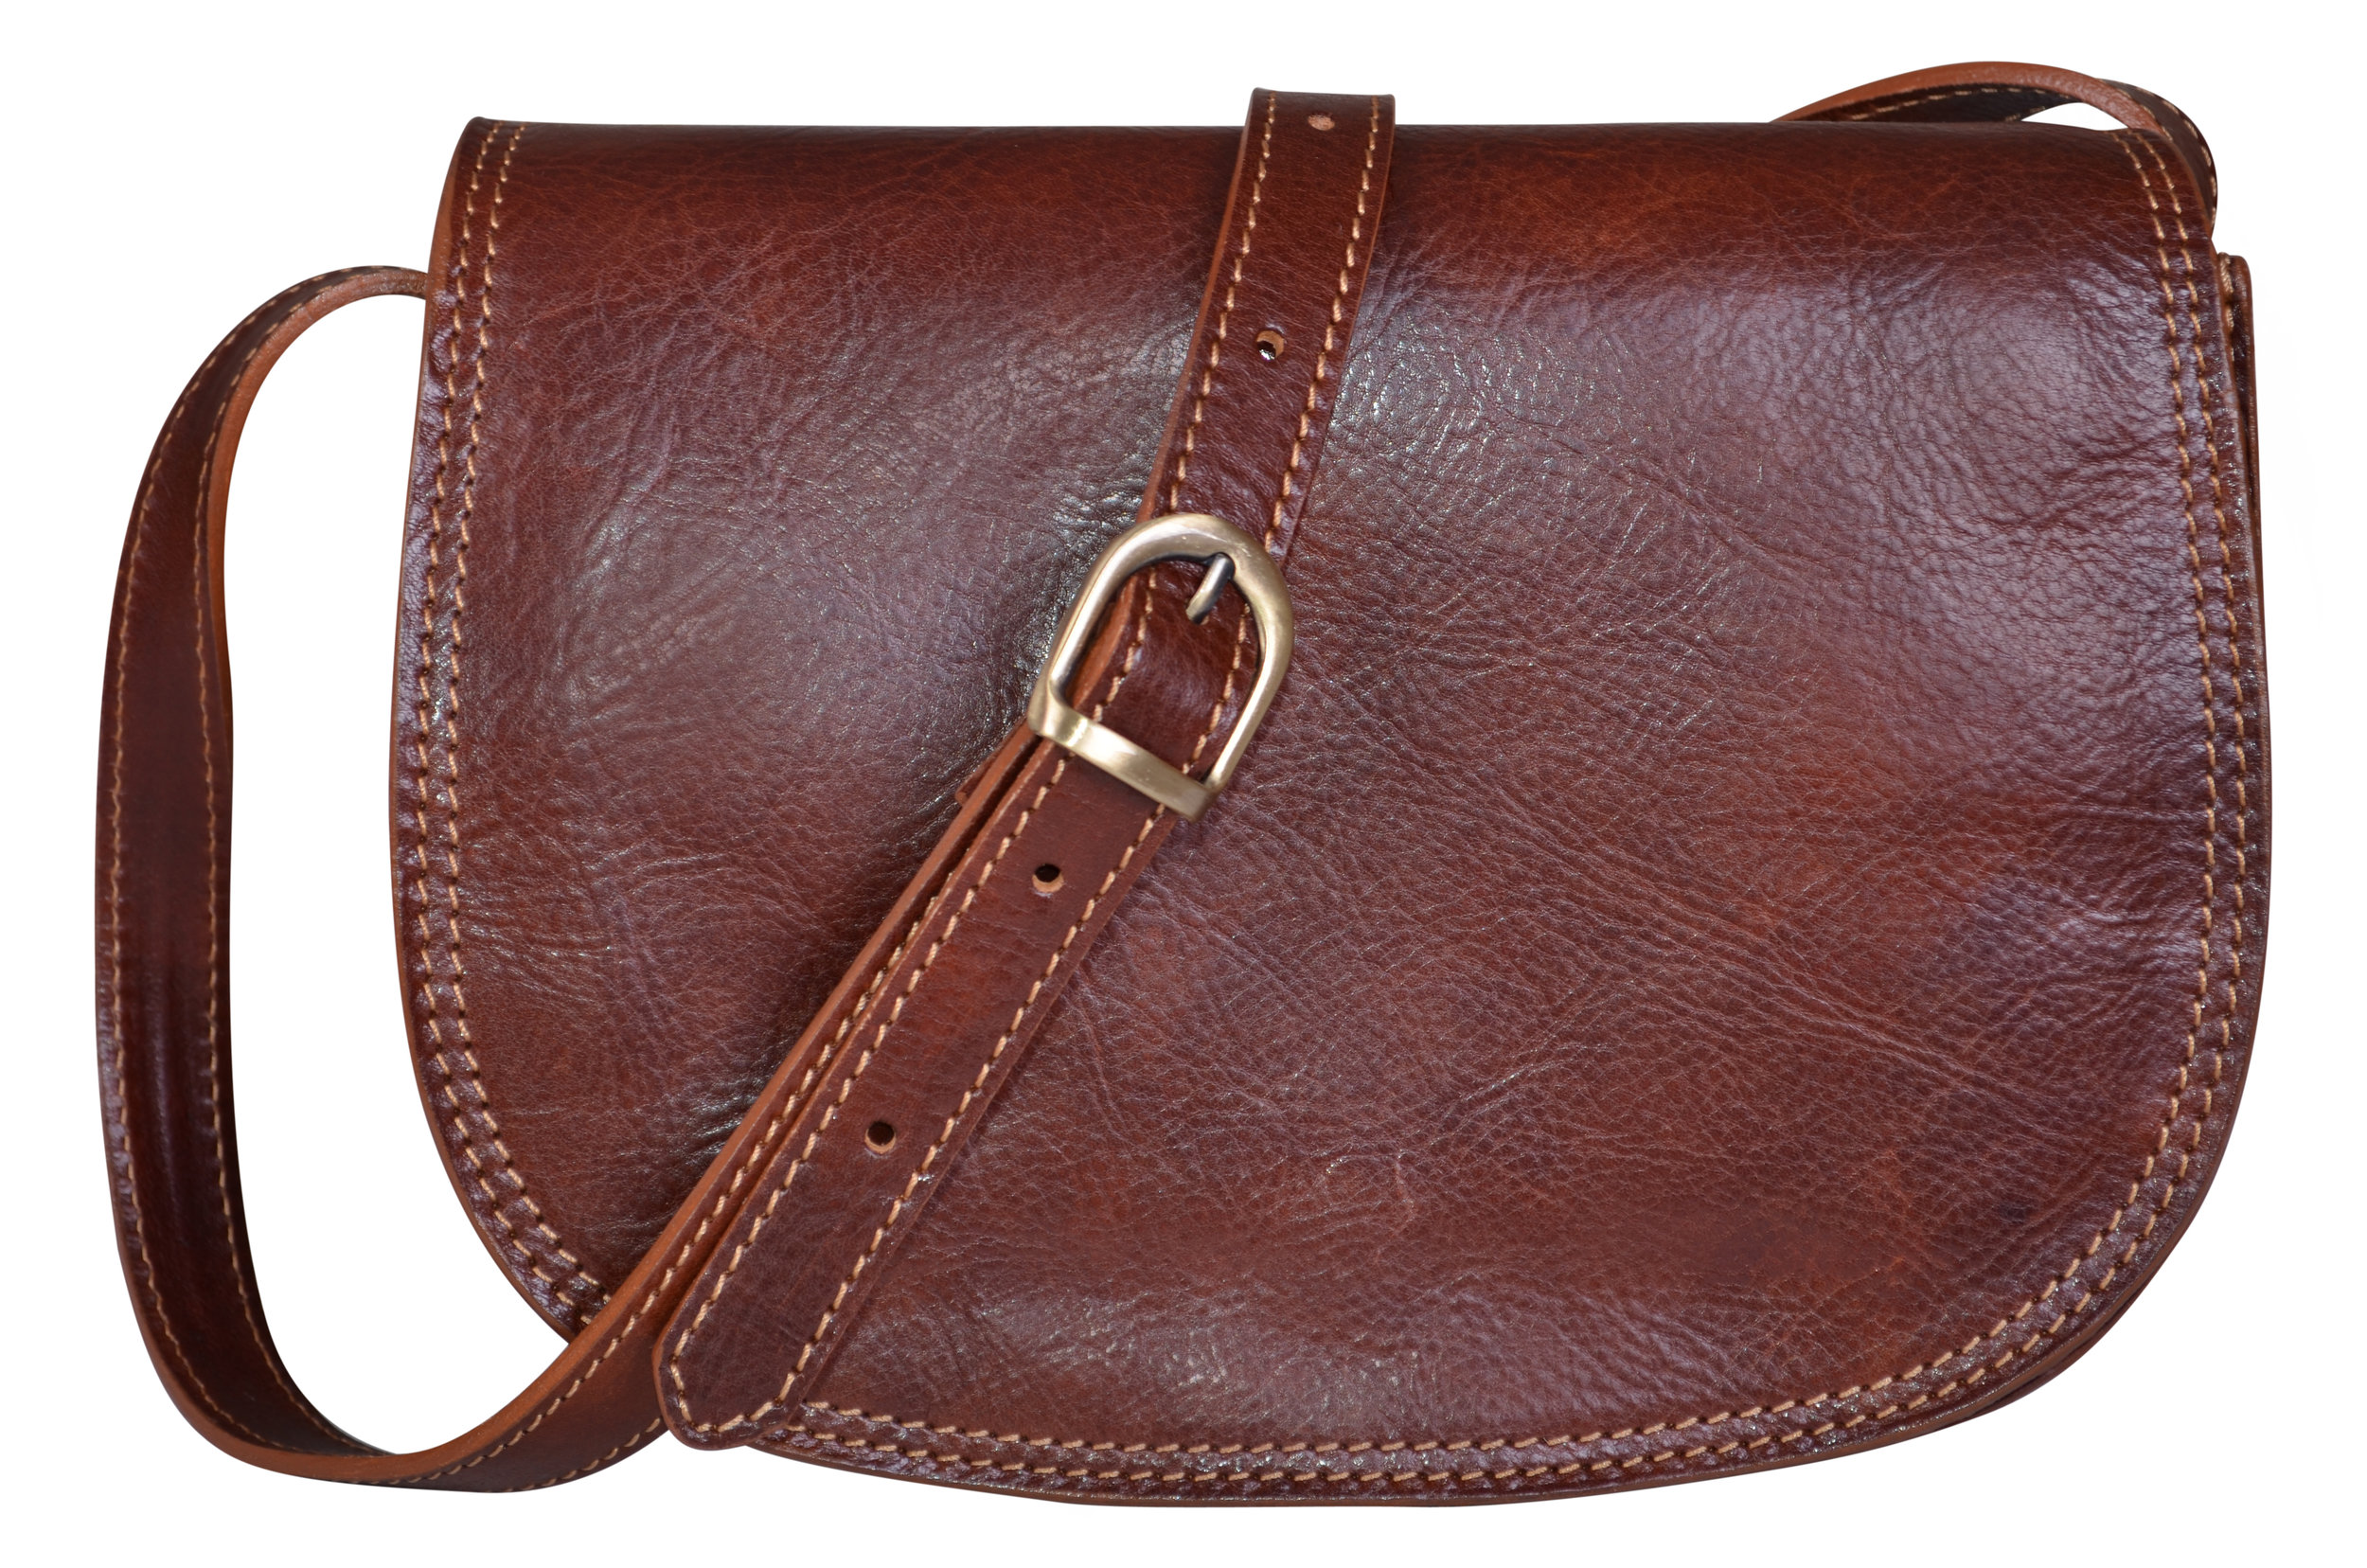 Genuine Italian Leather Sadle Bag - BACPMI_DB_1 - Italian Leather Handbags.jpg